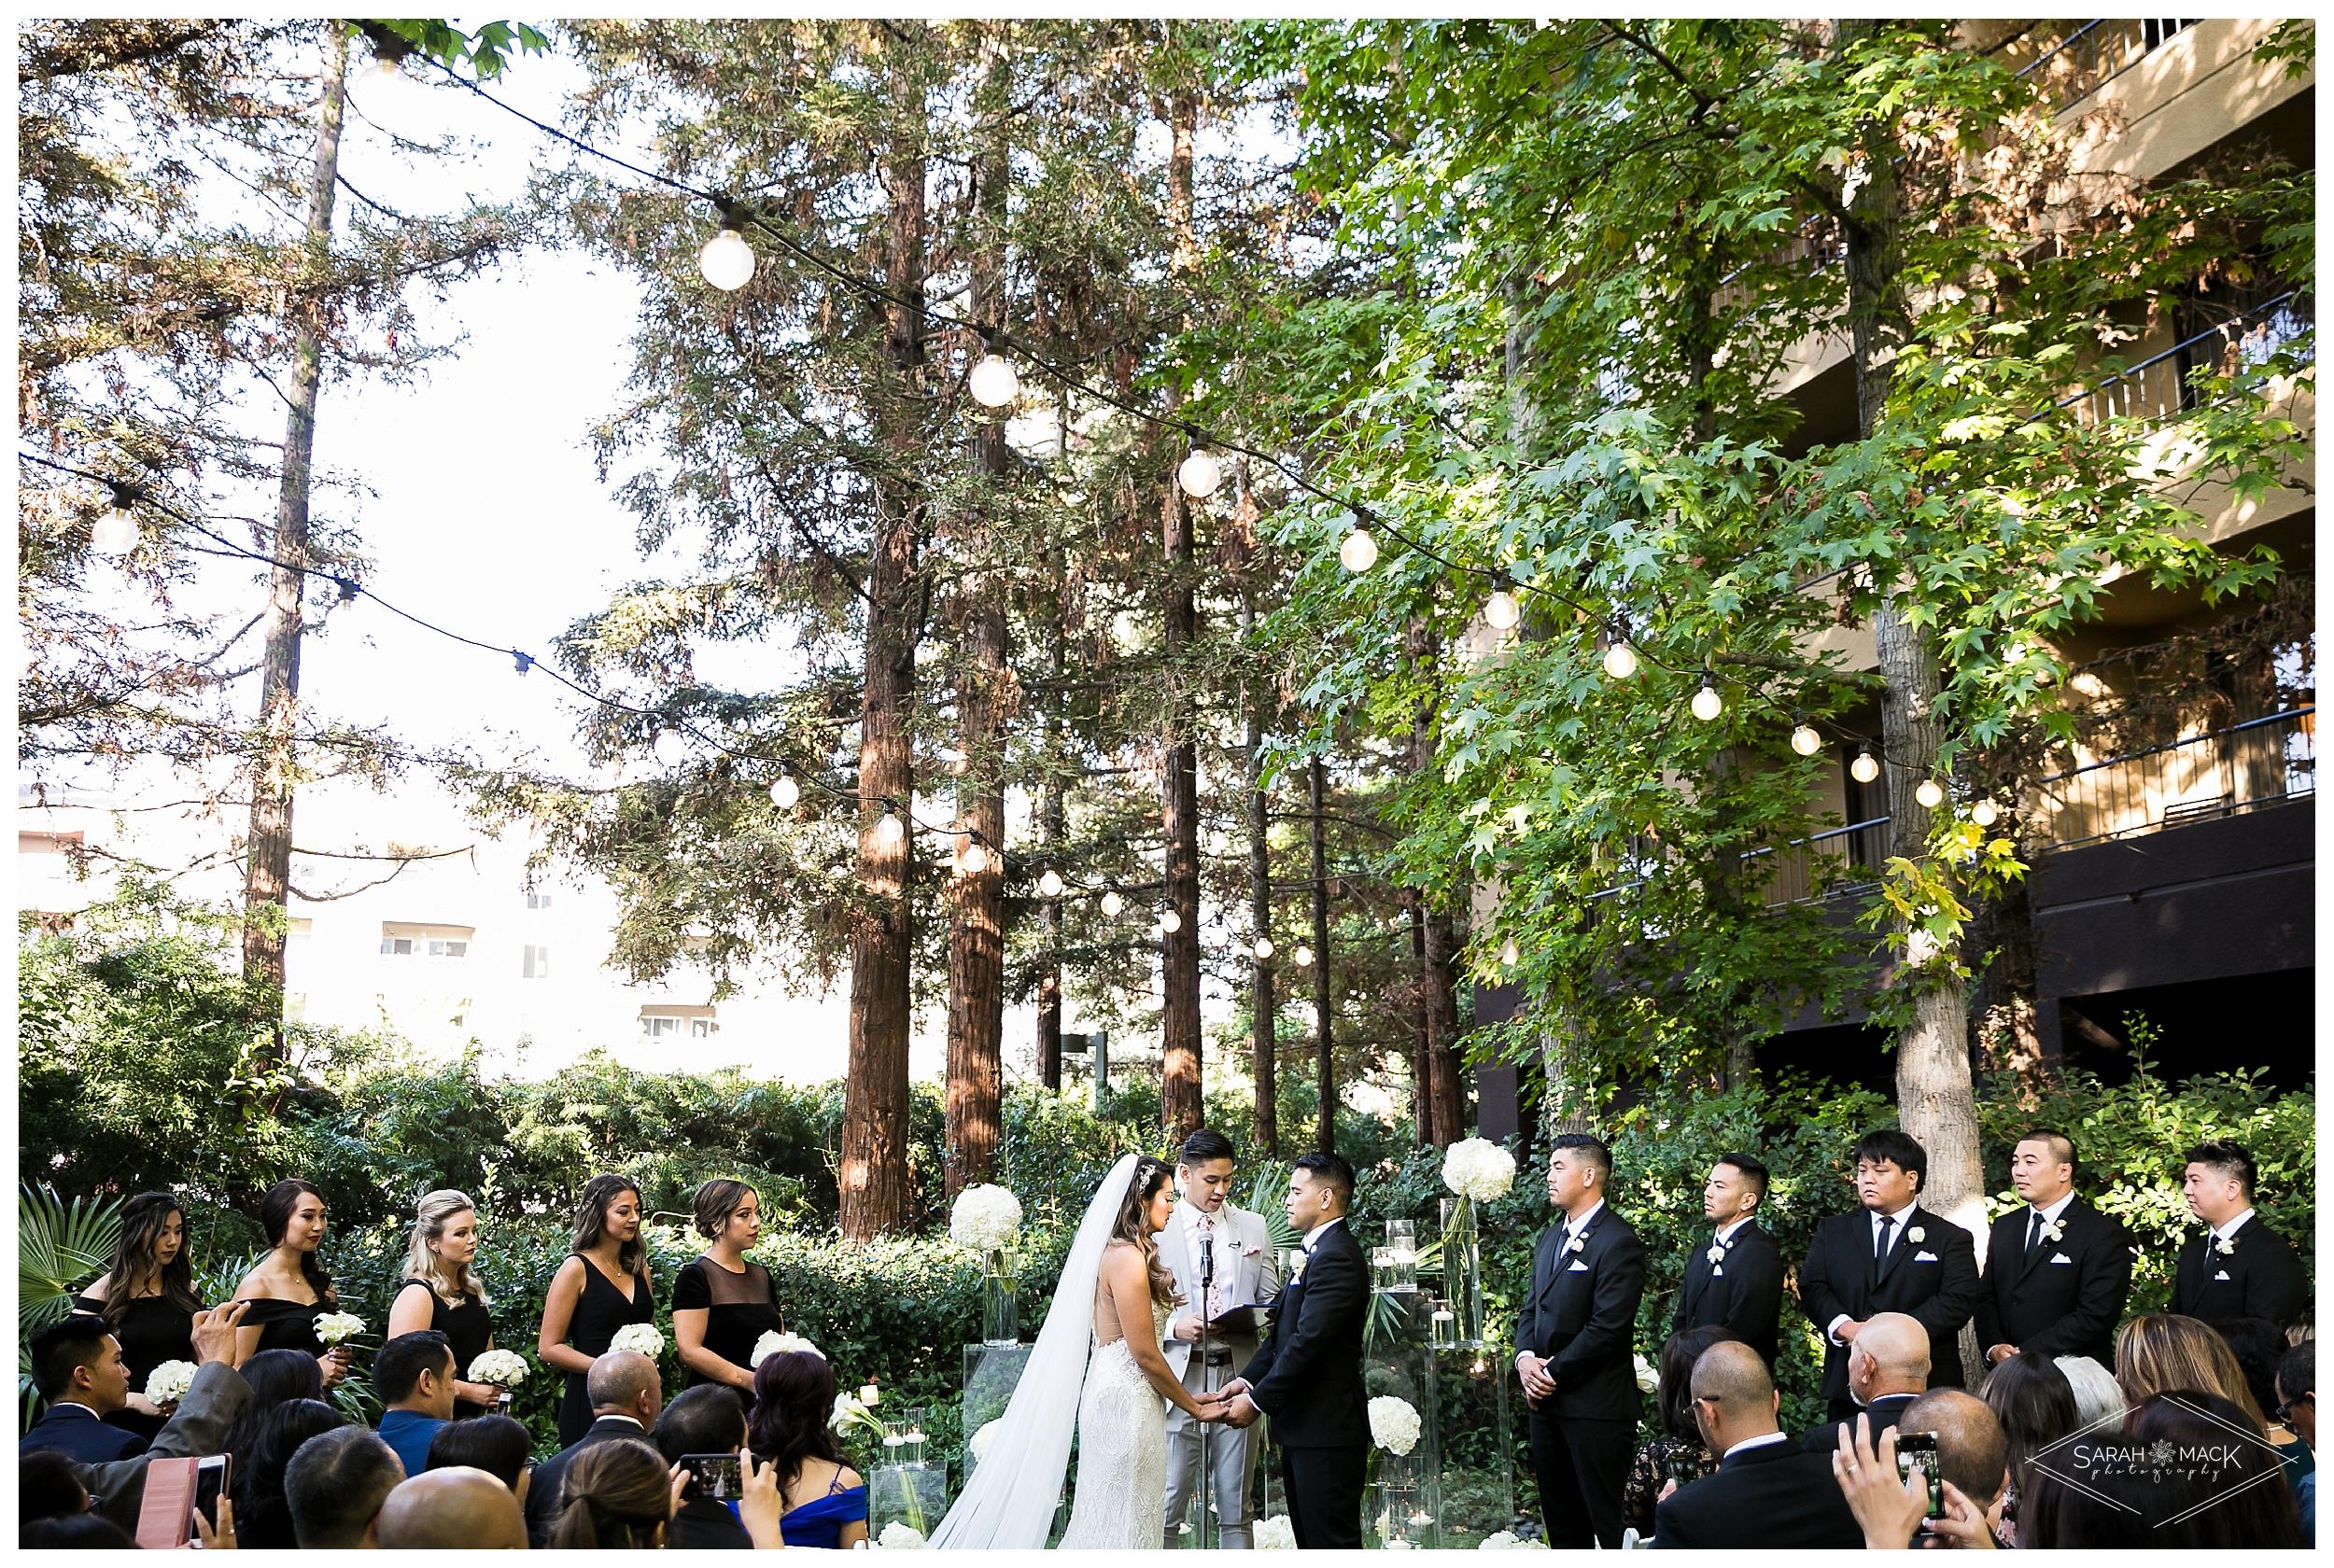 LE-Avenue-of-the-Arts-Costa-Mesa-Wedding-Photography-0146.jpg